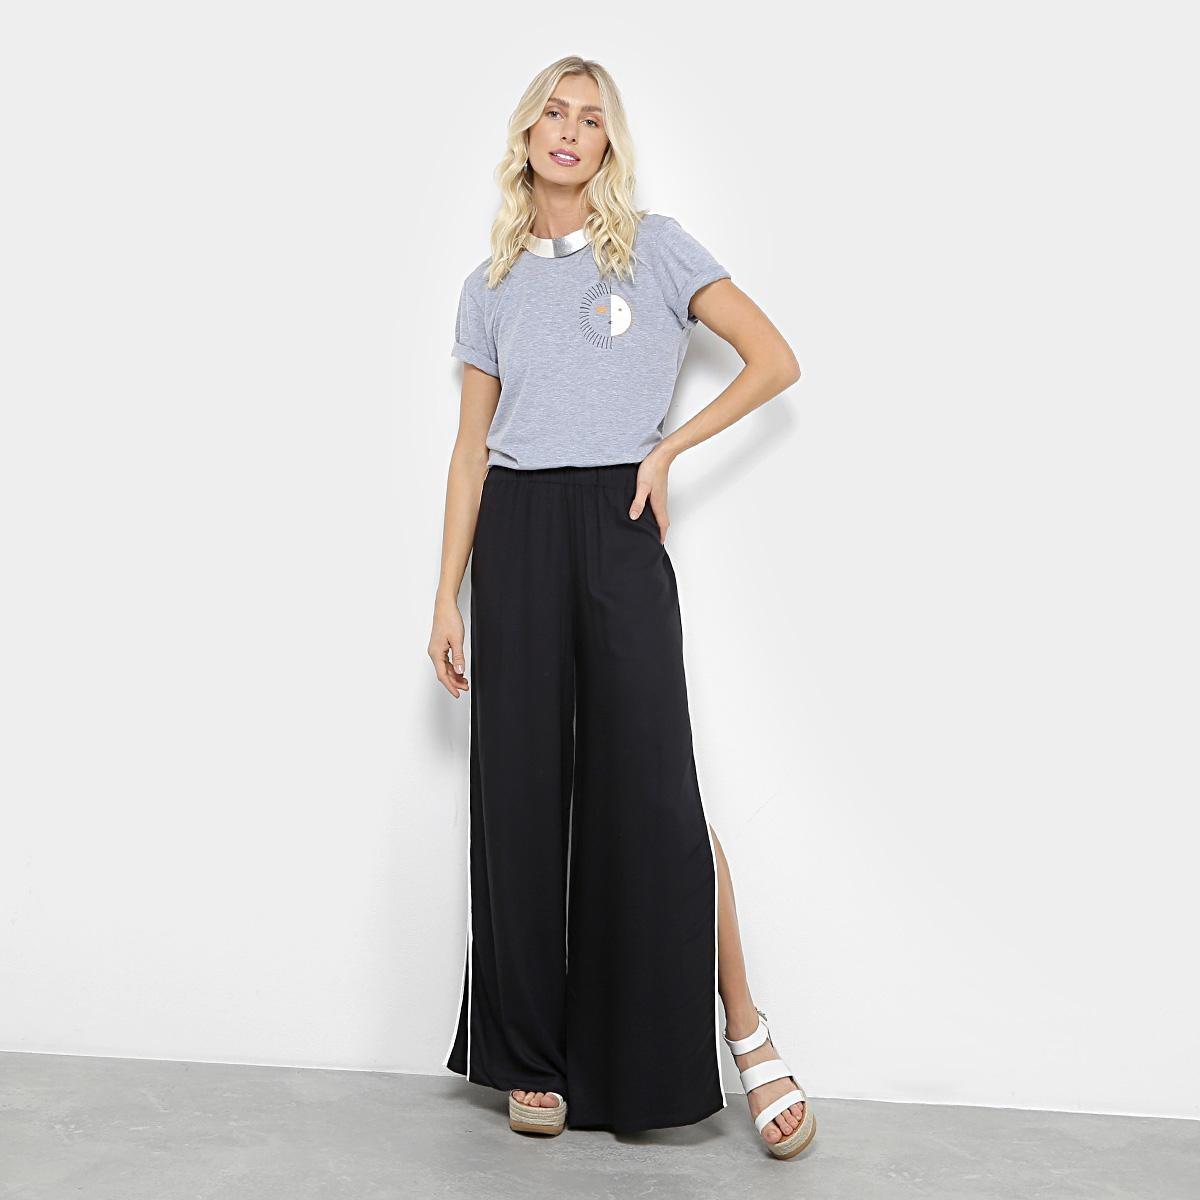 be6621f76 calça pantalona fendas farm listra lateral feminina. Carregando zoom.